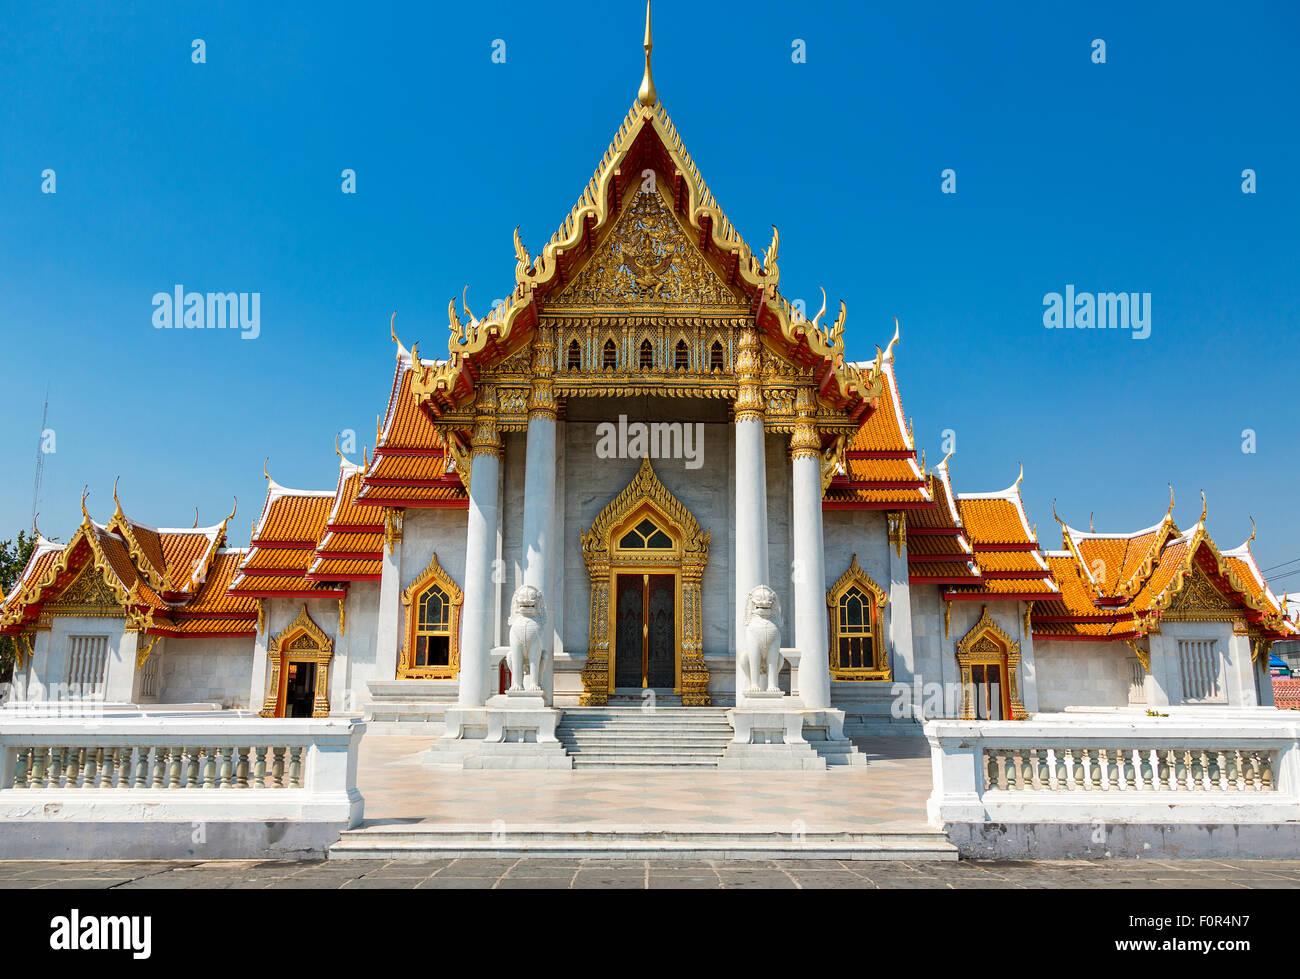 Tailandia, Bangkok, Wat Benchamabophit (templo de mármol) Imagen De Stock